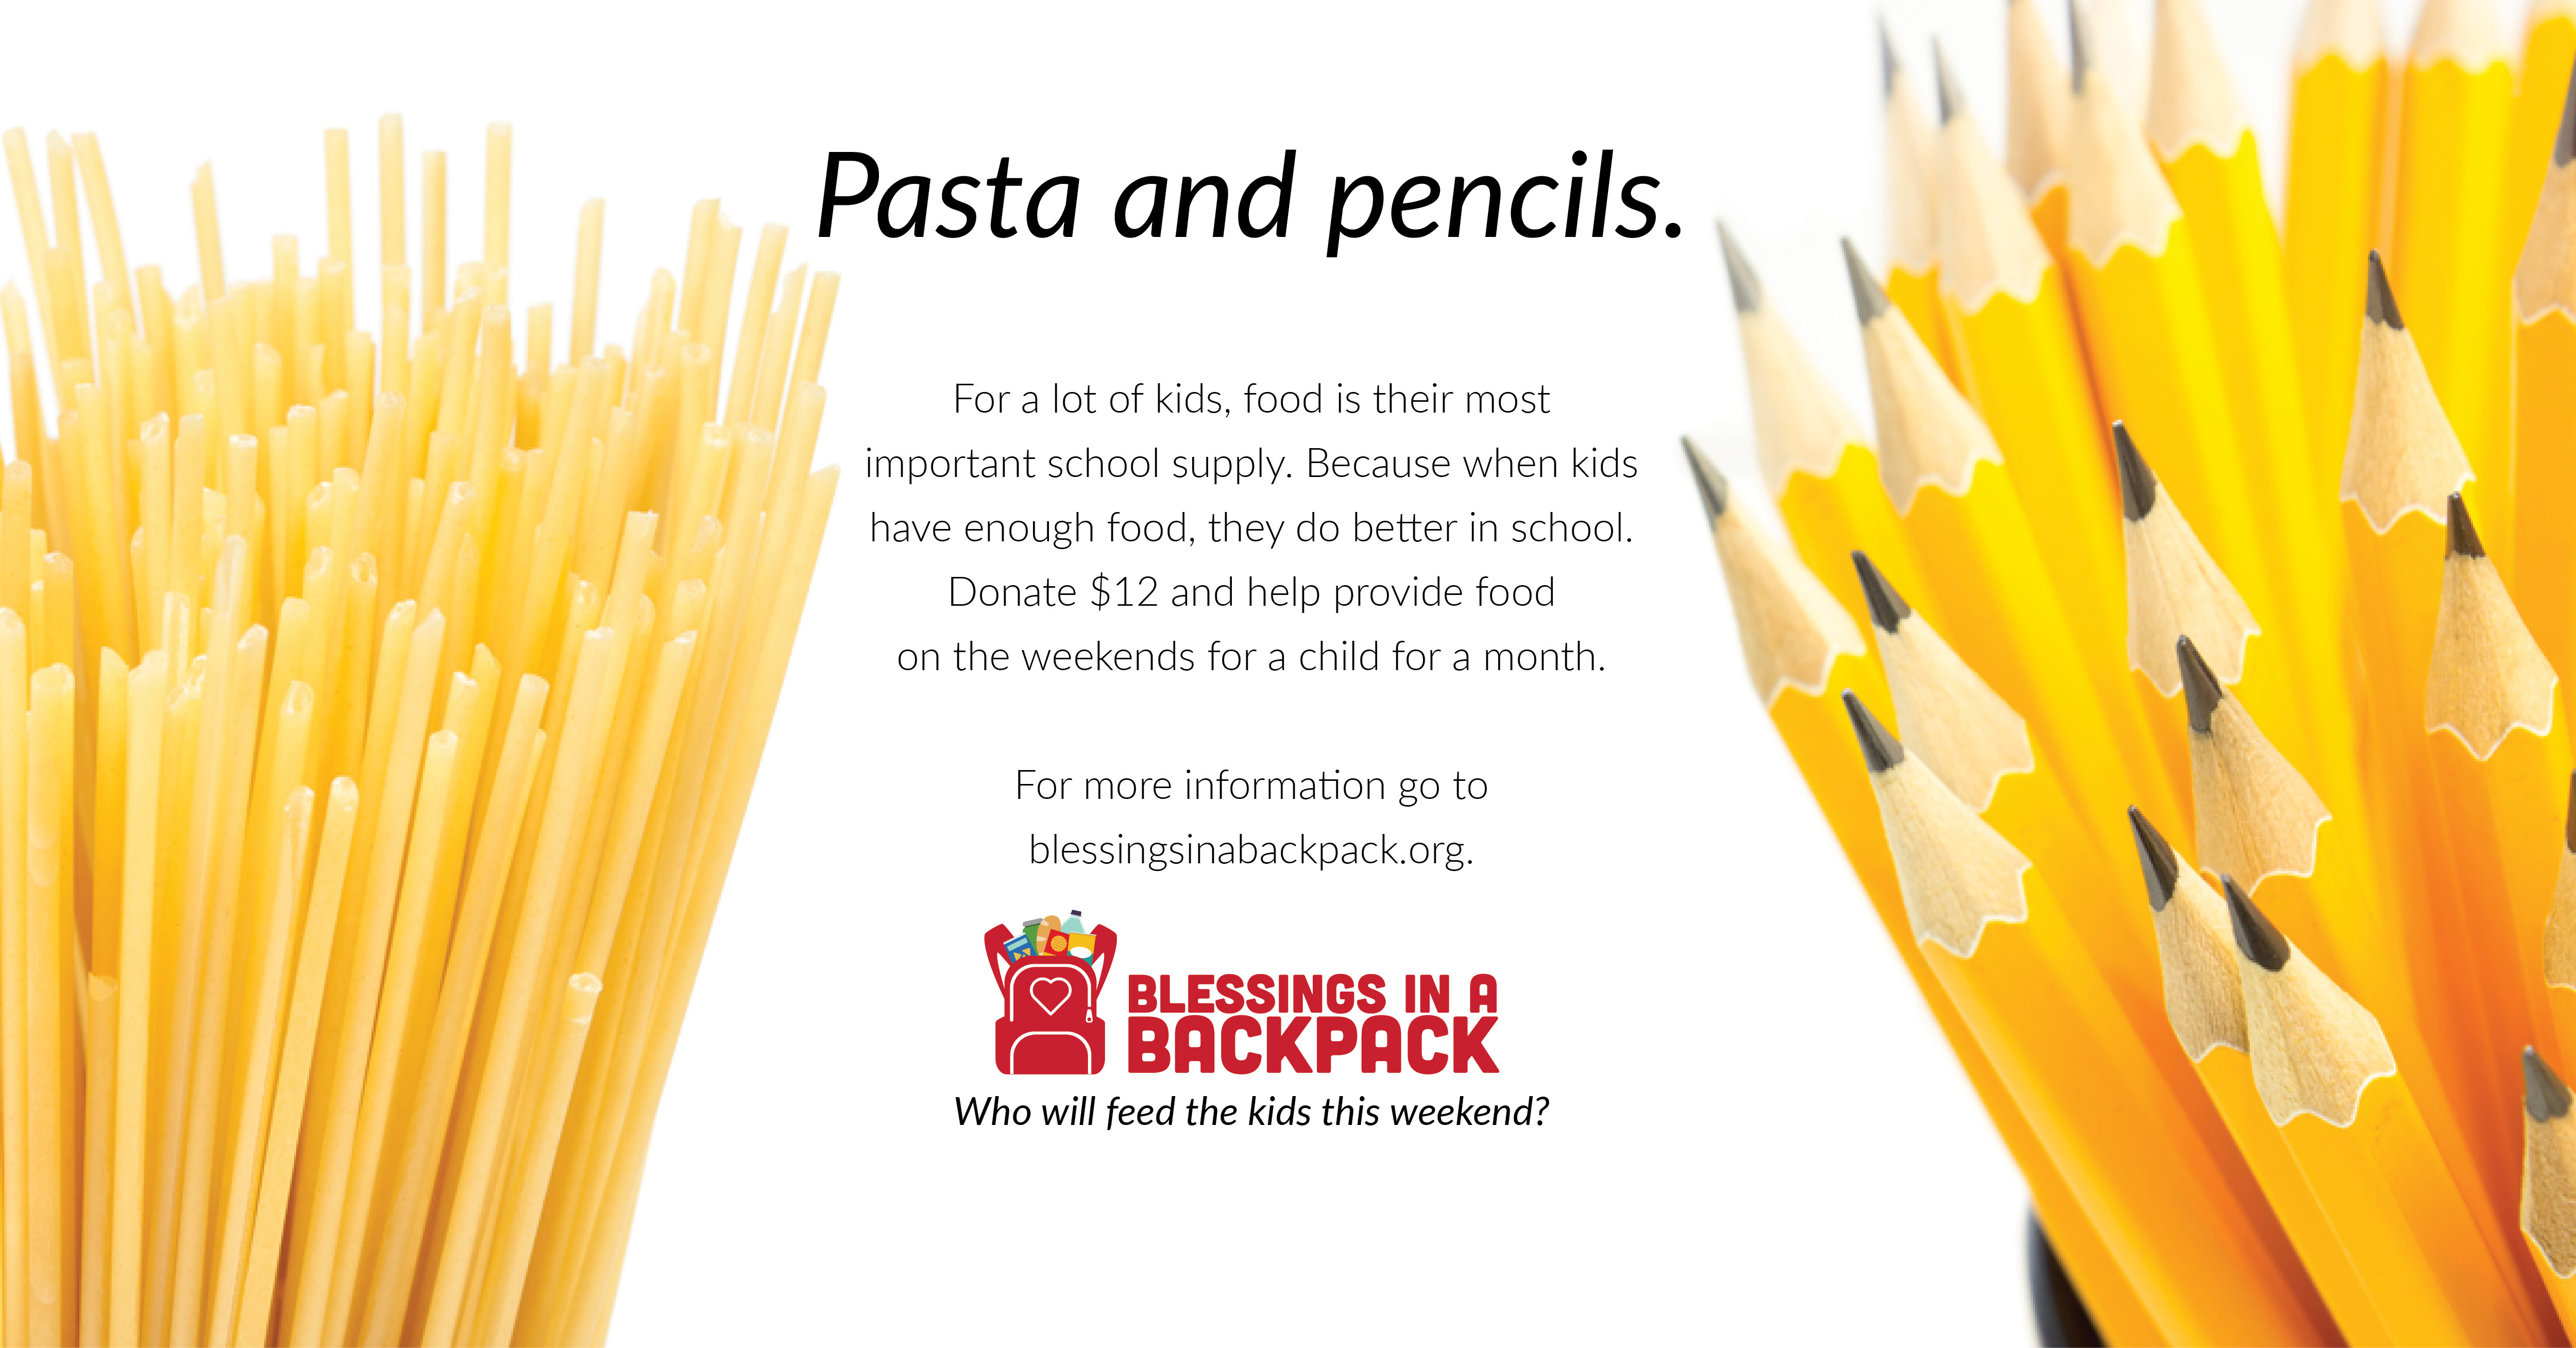 Pasta and Pencils